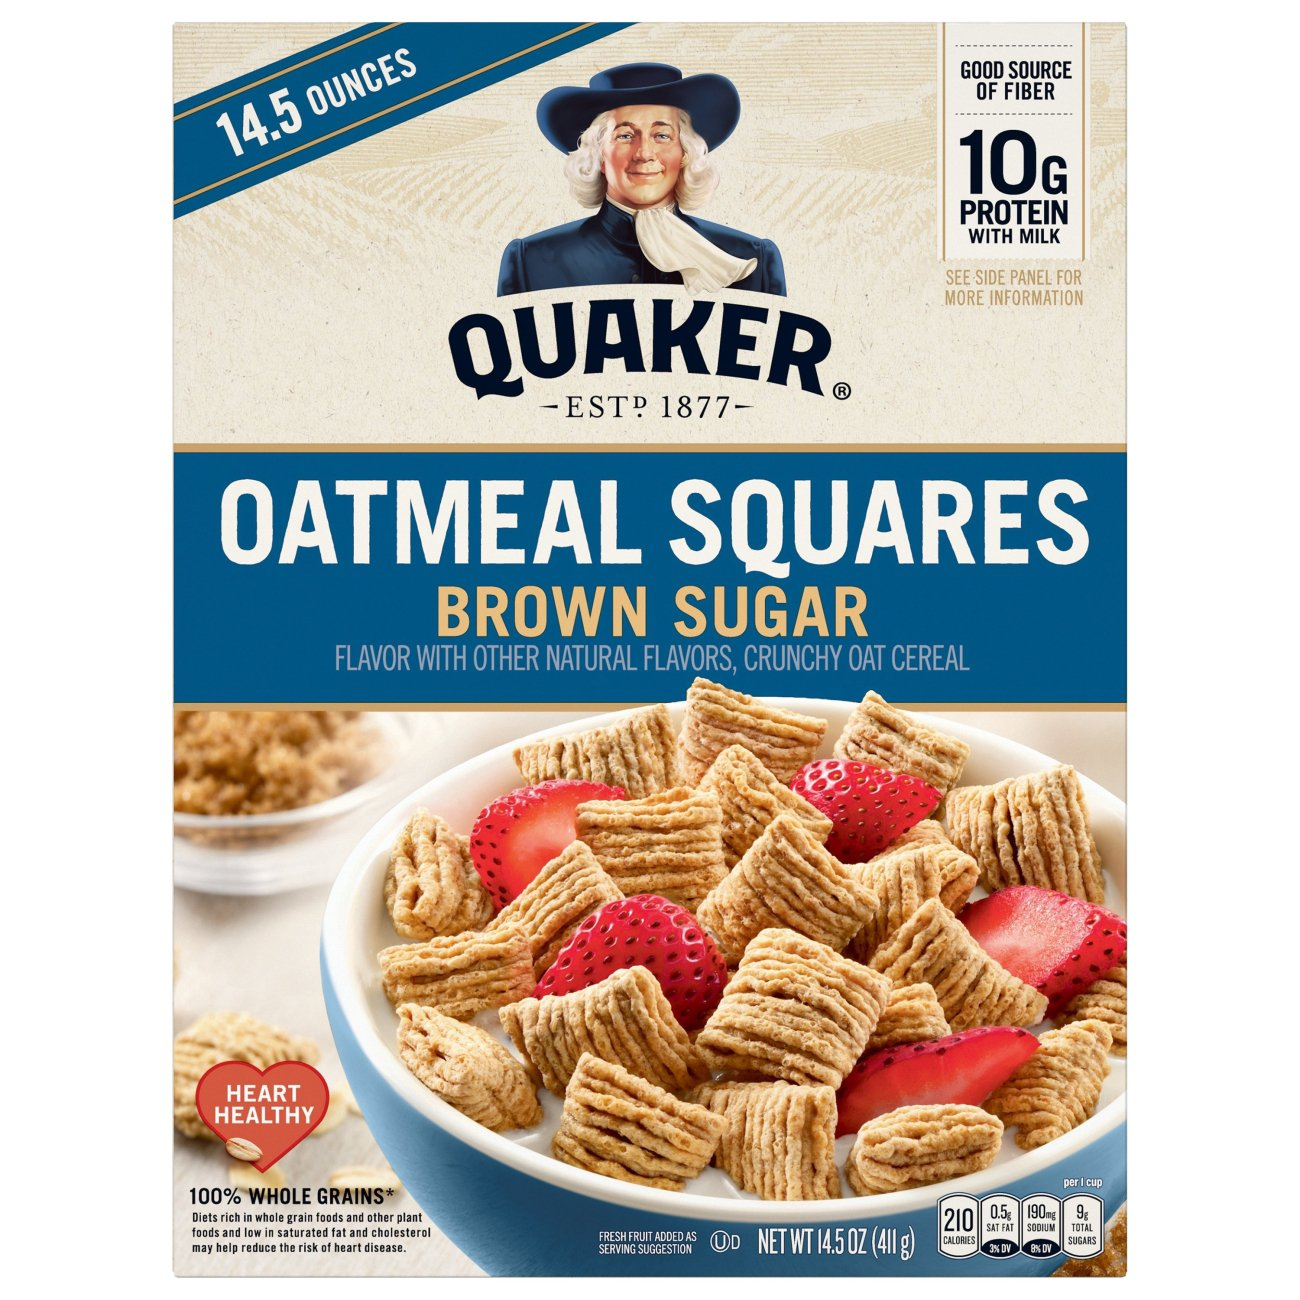 Quaker Brown Sugar Oatmeal Squares